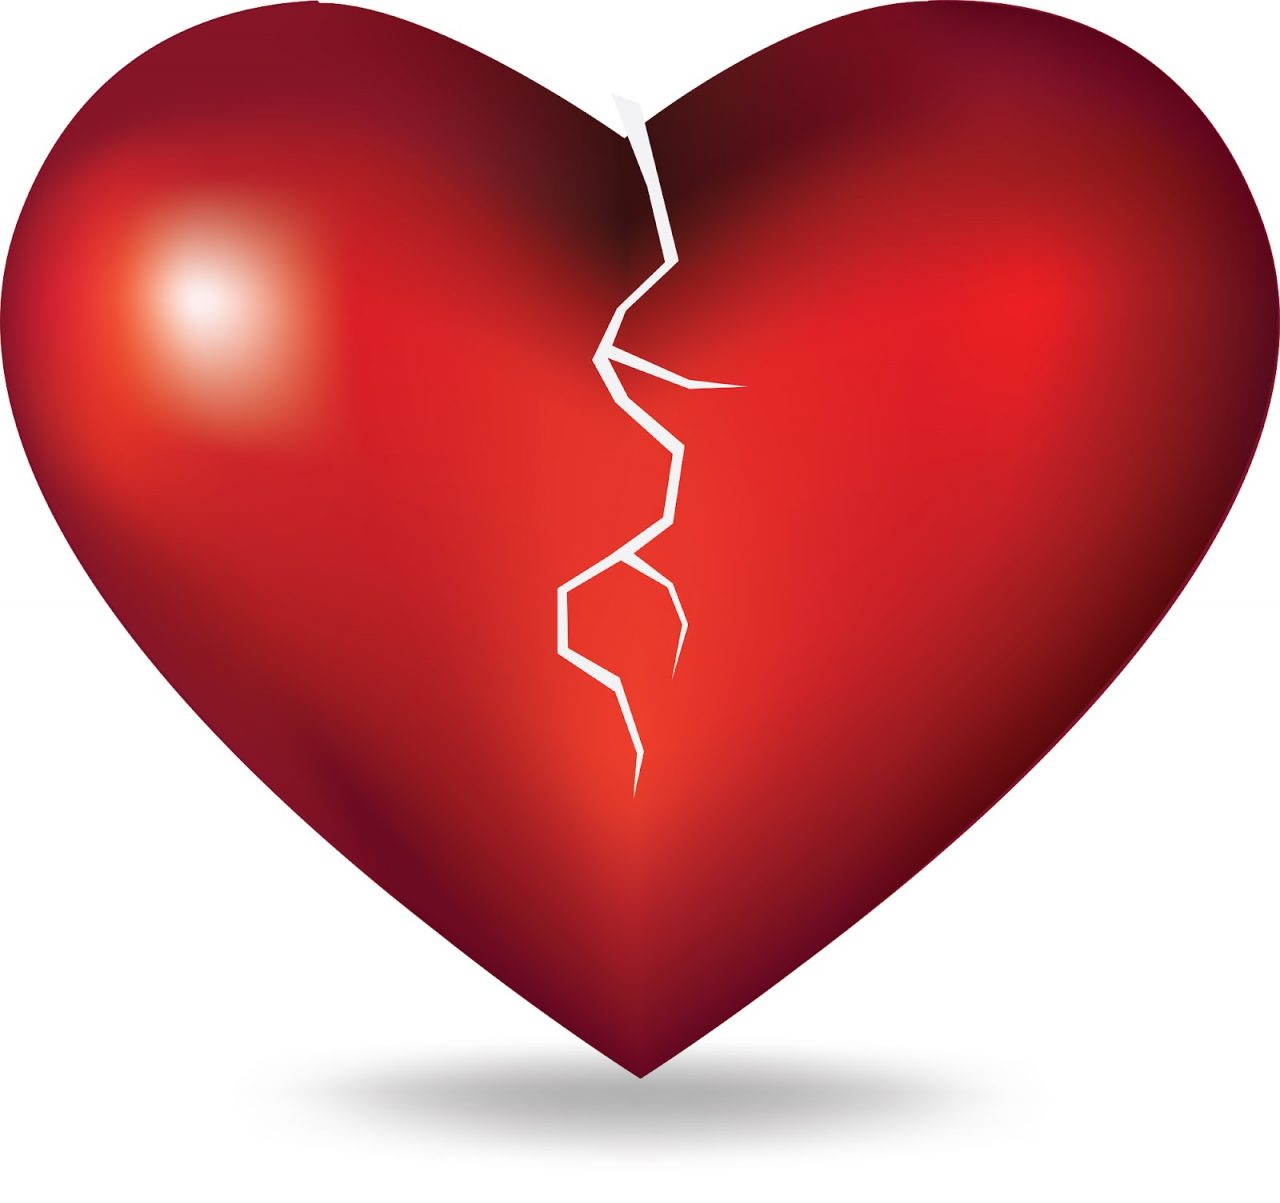 картинка сердце не билось площадь